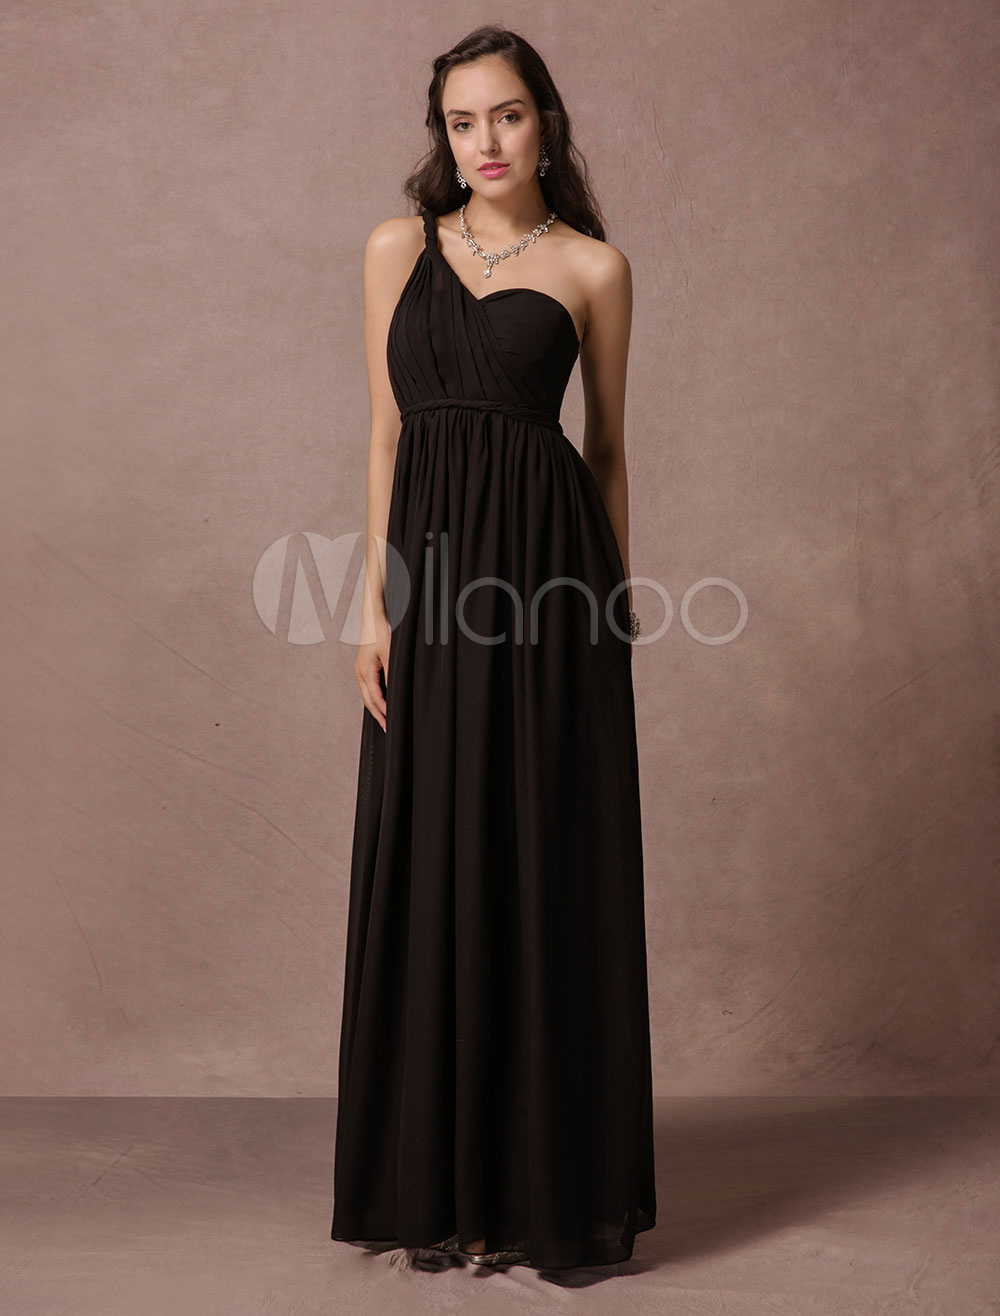 Black Bridesmaid Dress Maxi Chiffon Evening Dress A Line One Shoulder Backless Floor Length Party Dress (Wedding Evening Dresses) photo